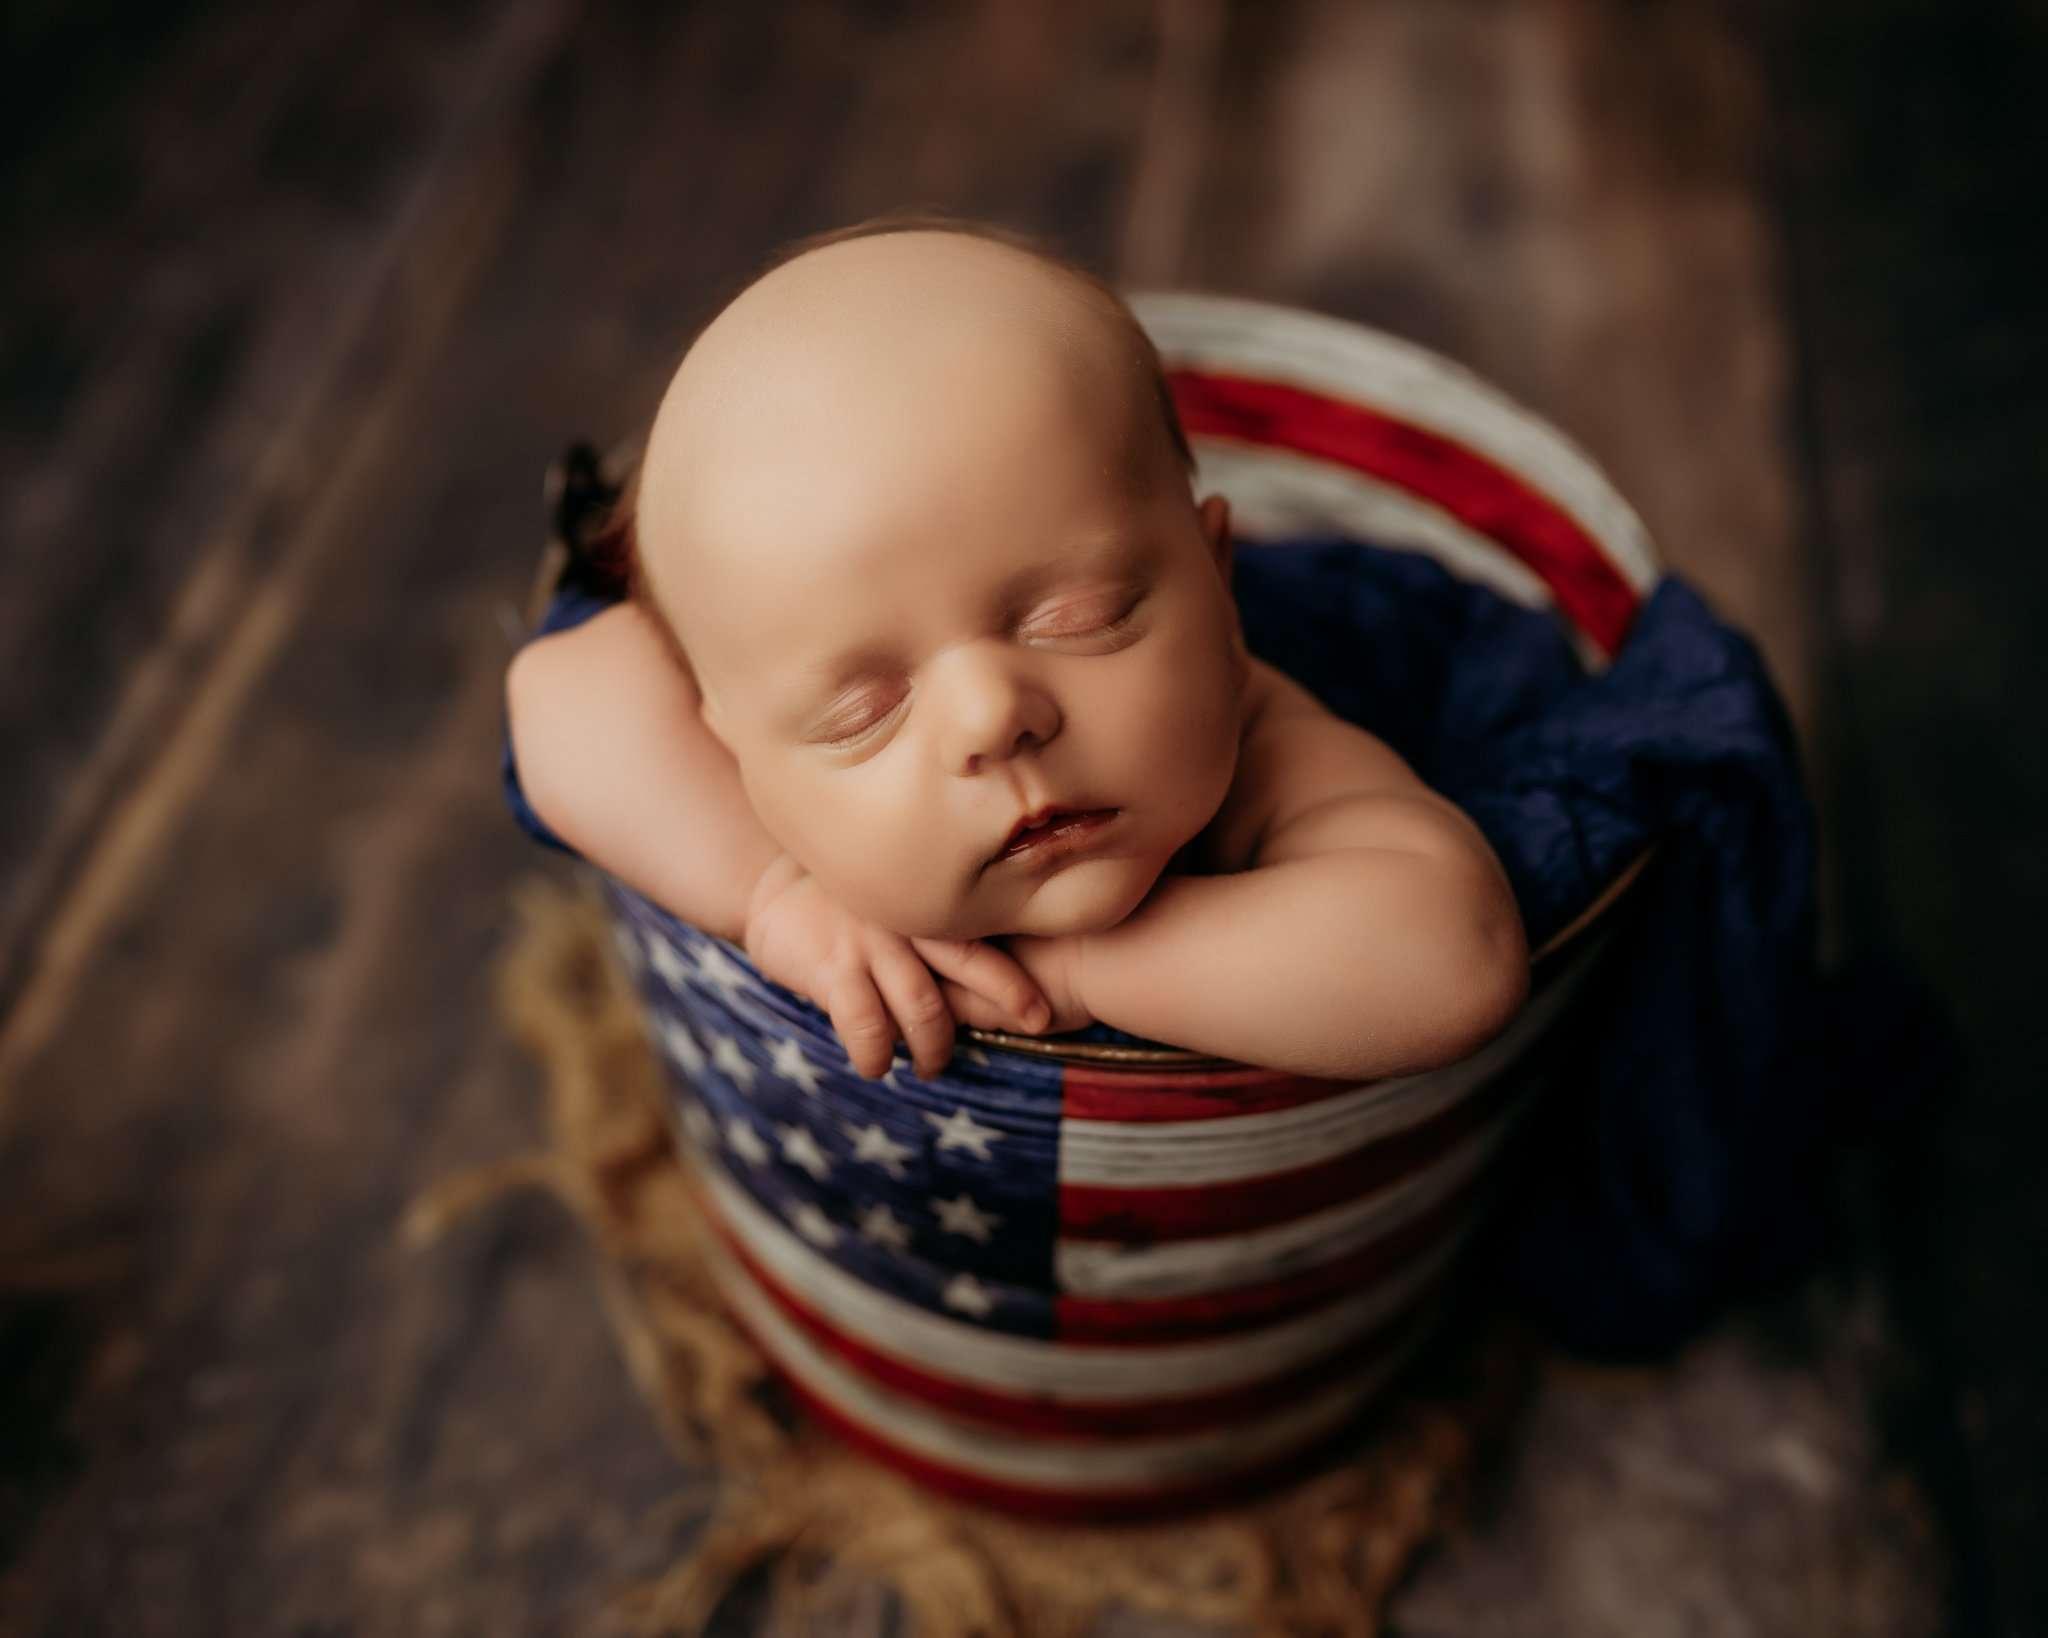 baby in bucket sleeping with head on its hands